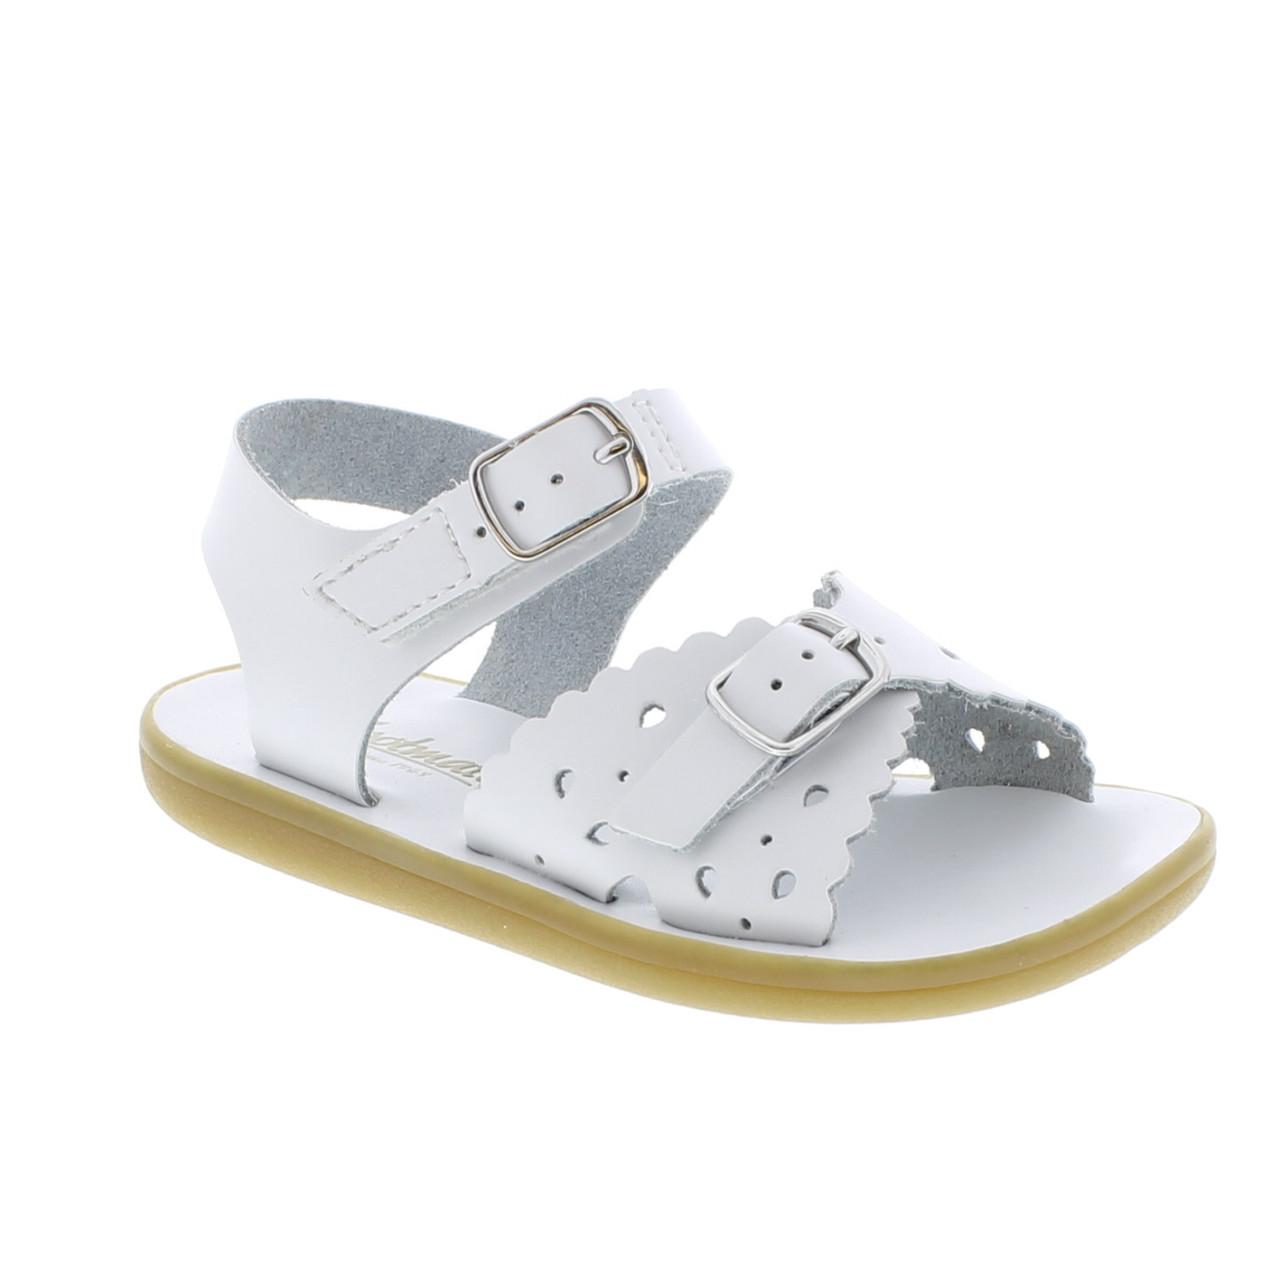 Footmates *ARIEL* Mint Sandals